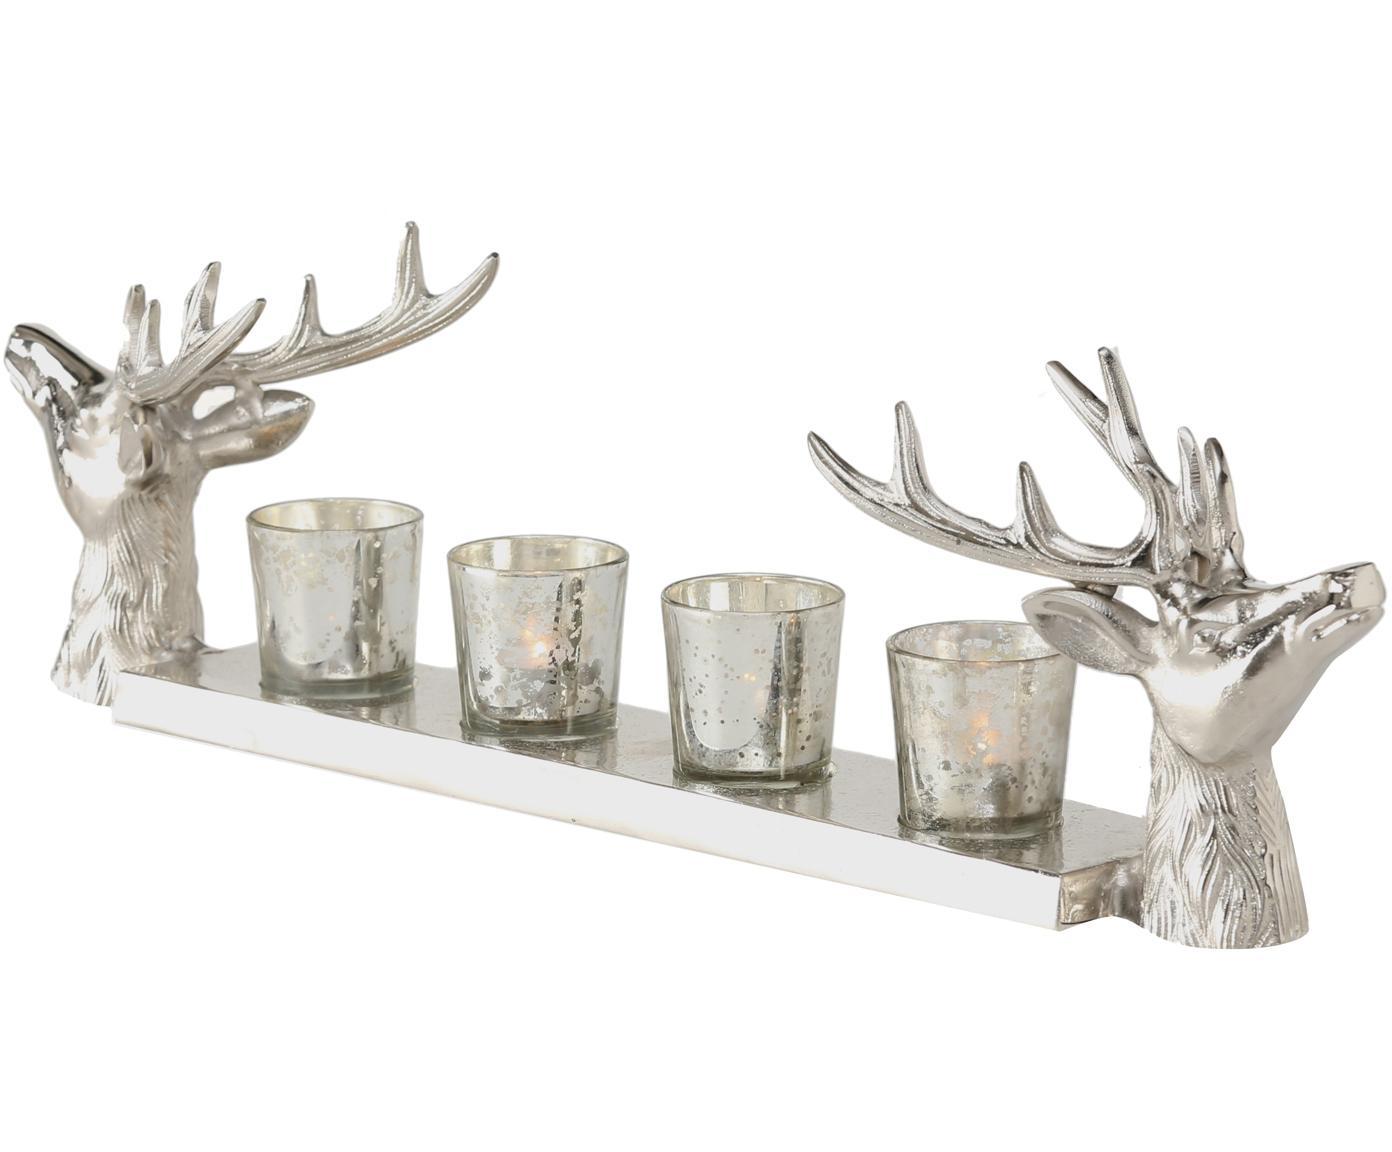 Set portacandele Hirsch 5 pz, Vassoio: alluminio, Portacandela: vetro, Argentato, Larg. 56 x Alt. 16 cm